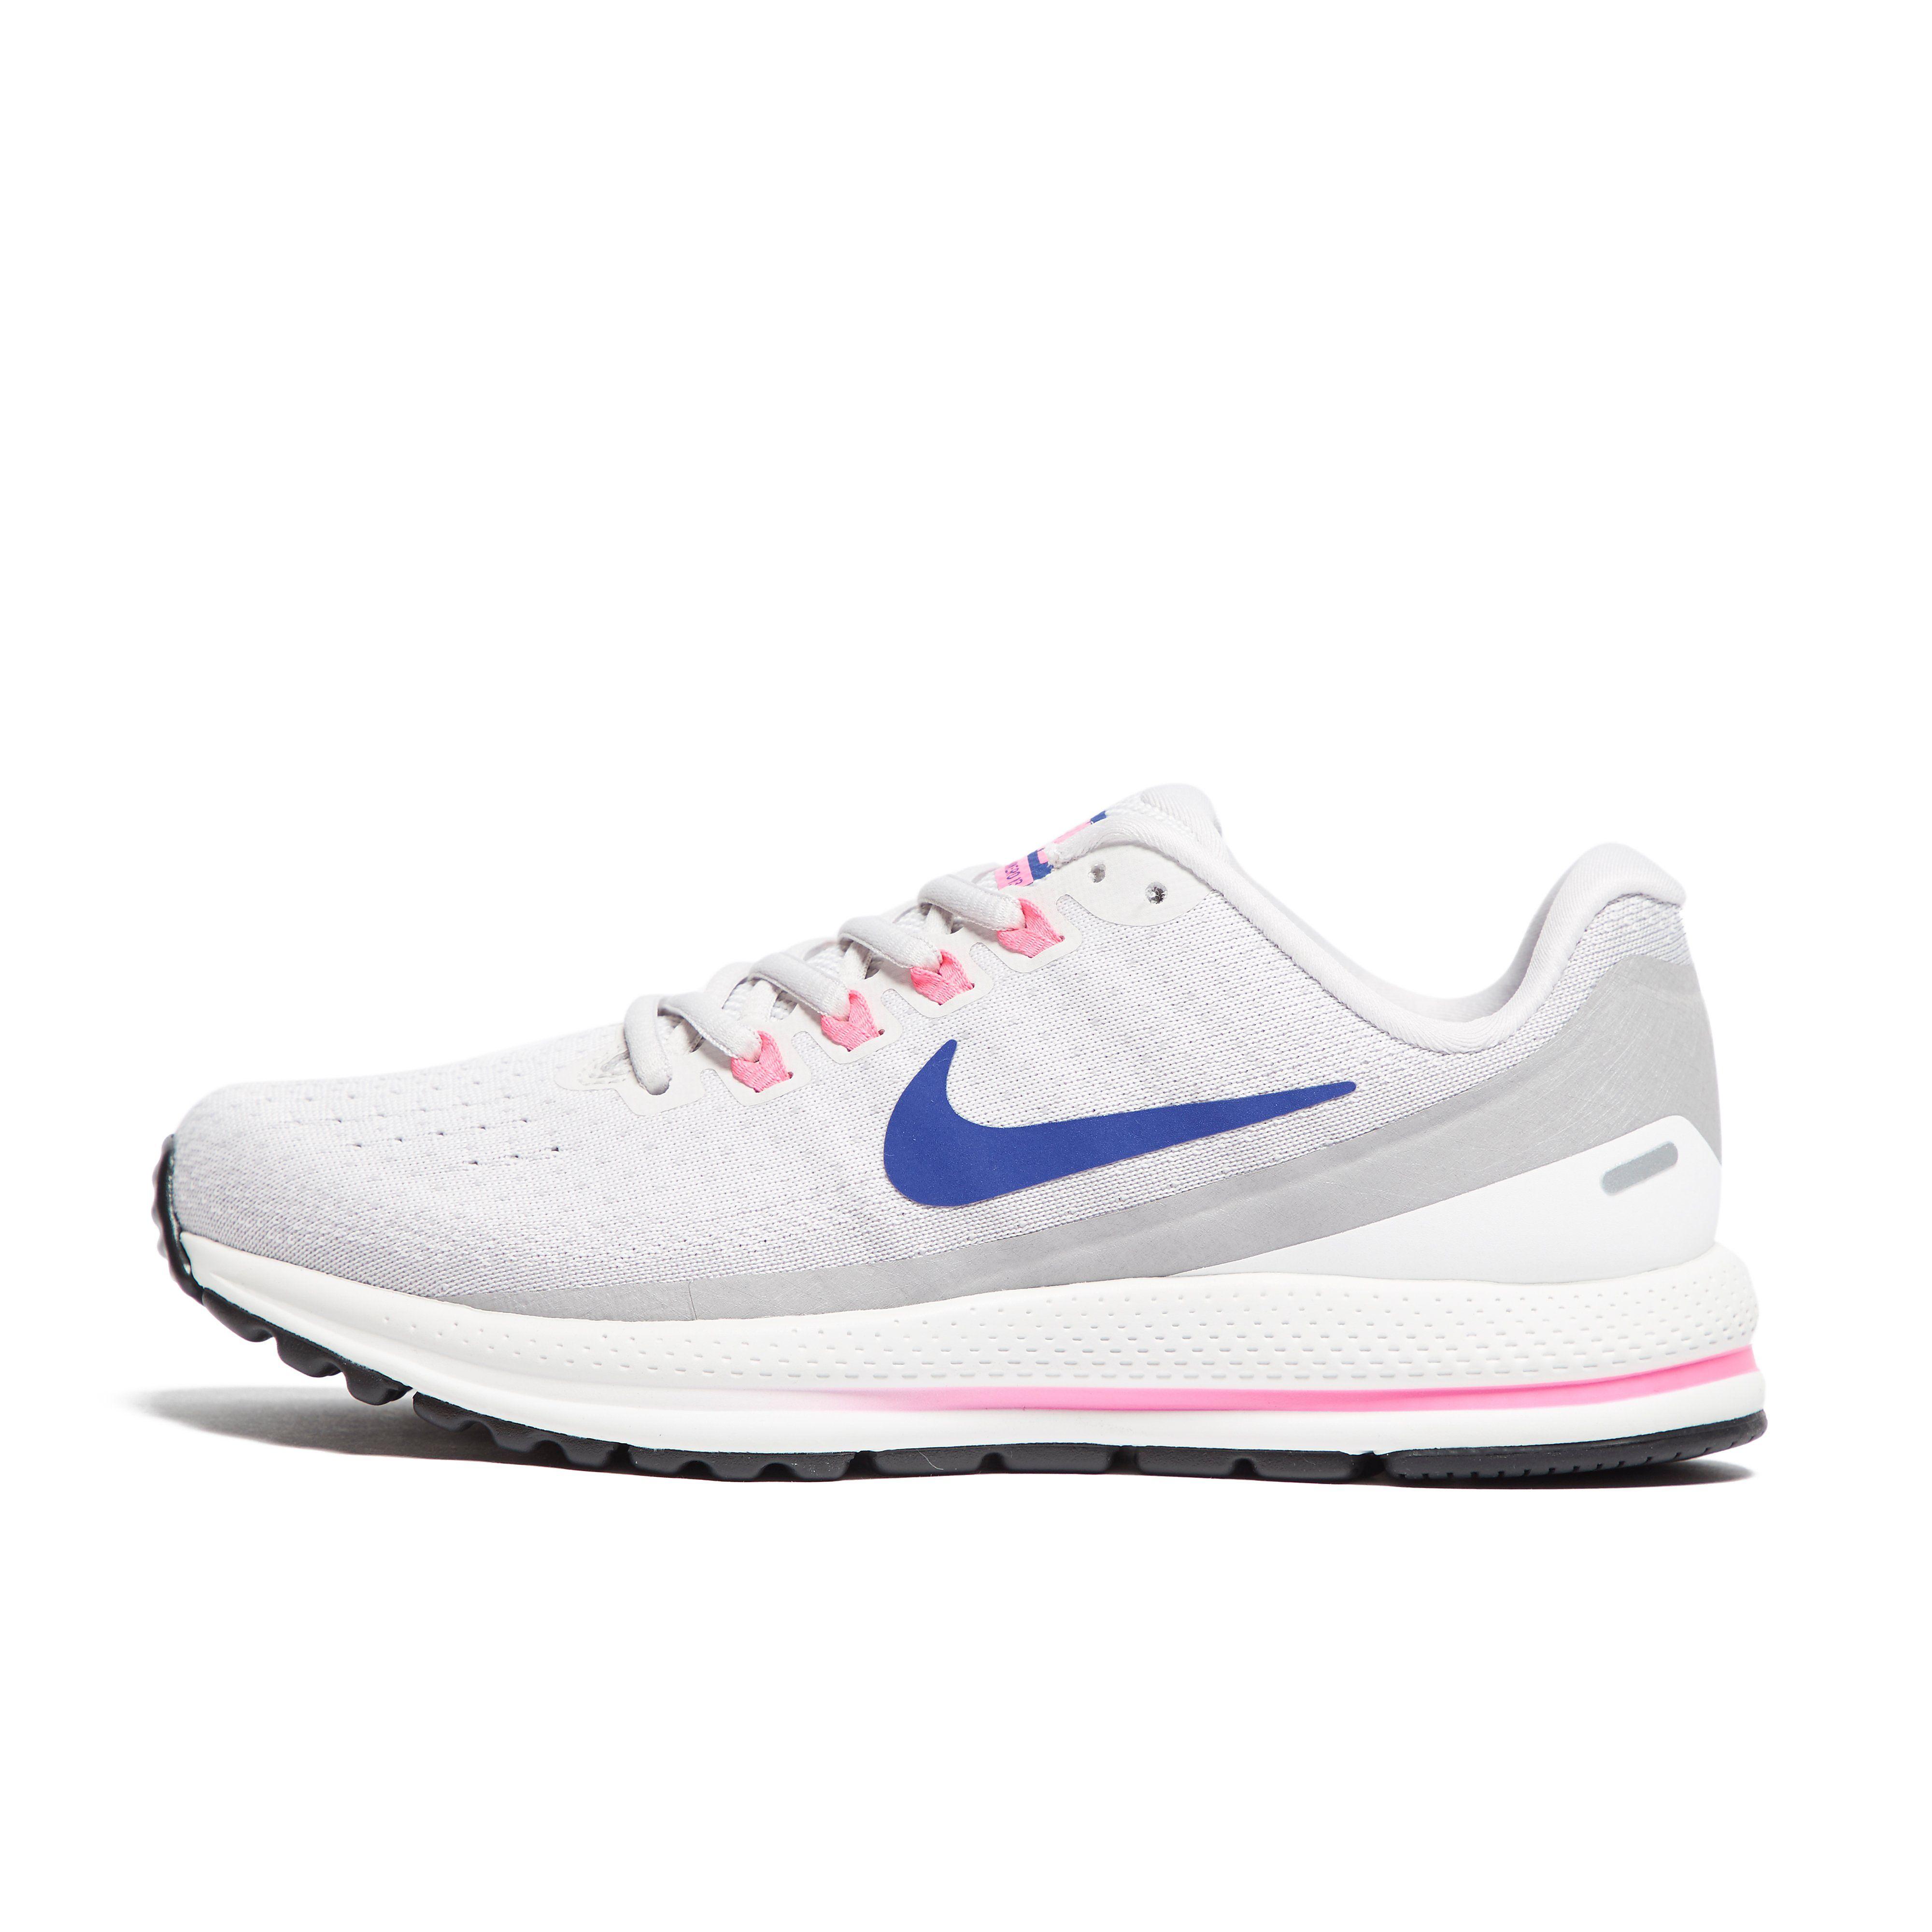 Nike Air Zoom Vomero 13 Donna's In esecuzione ActivInstinct scarpe   ActivInstinct esecuzione 74fea1